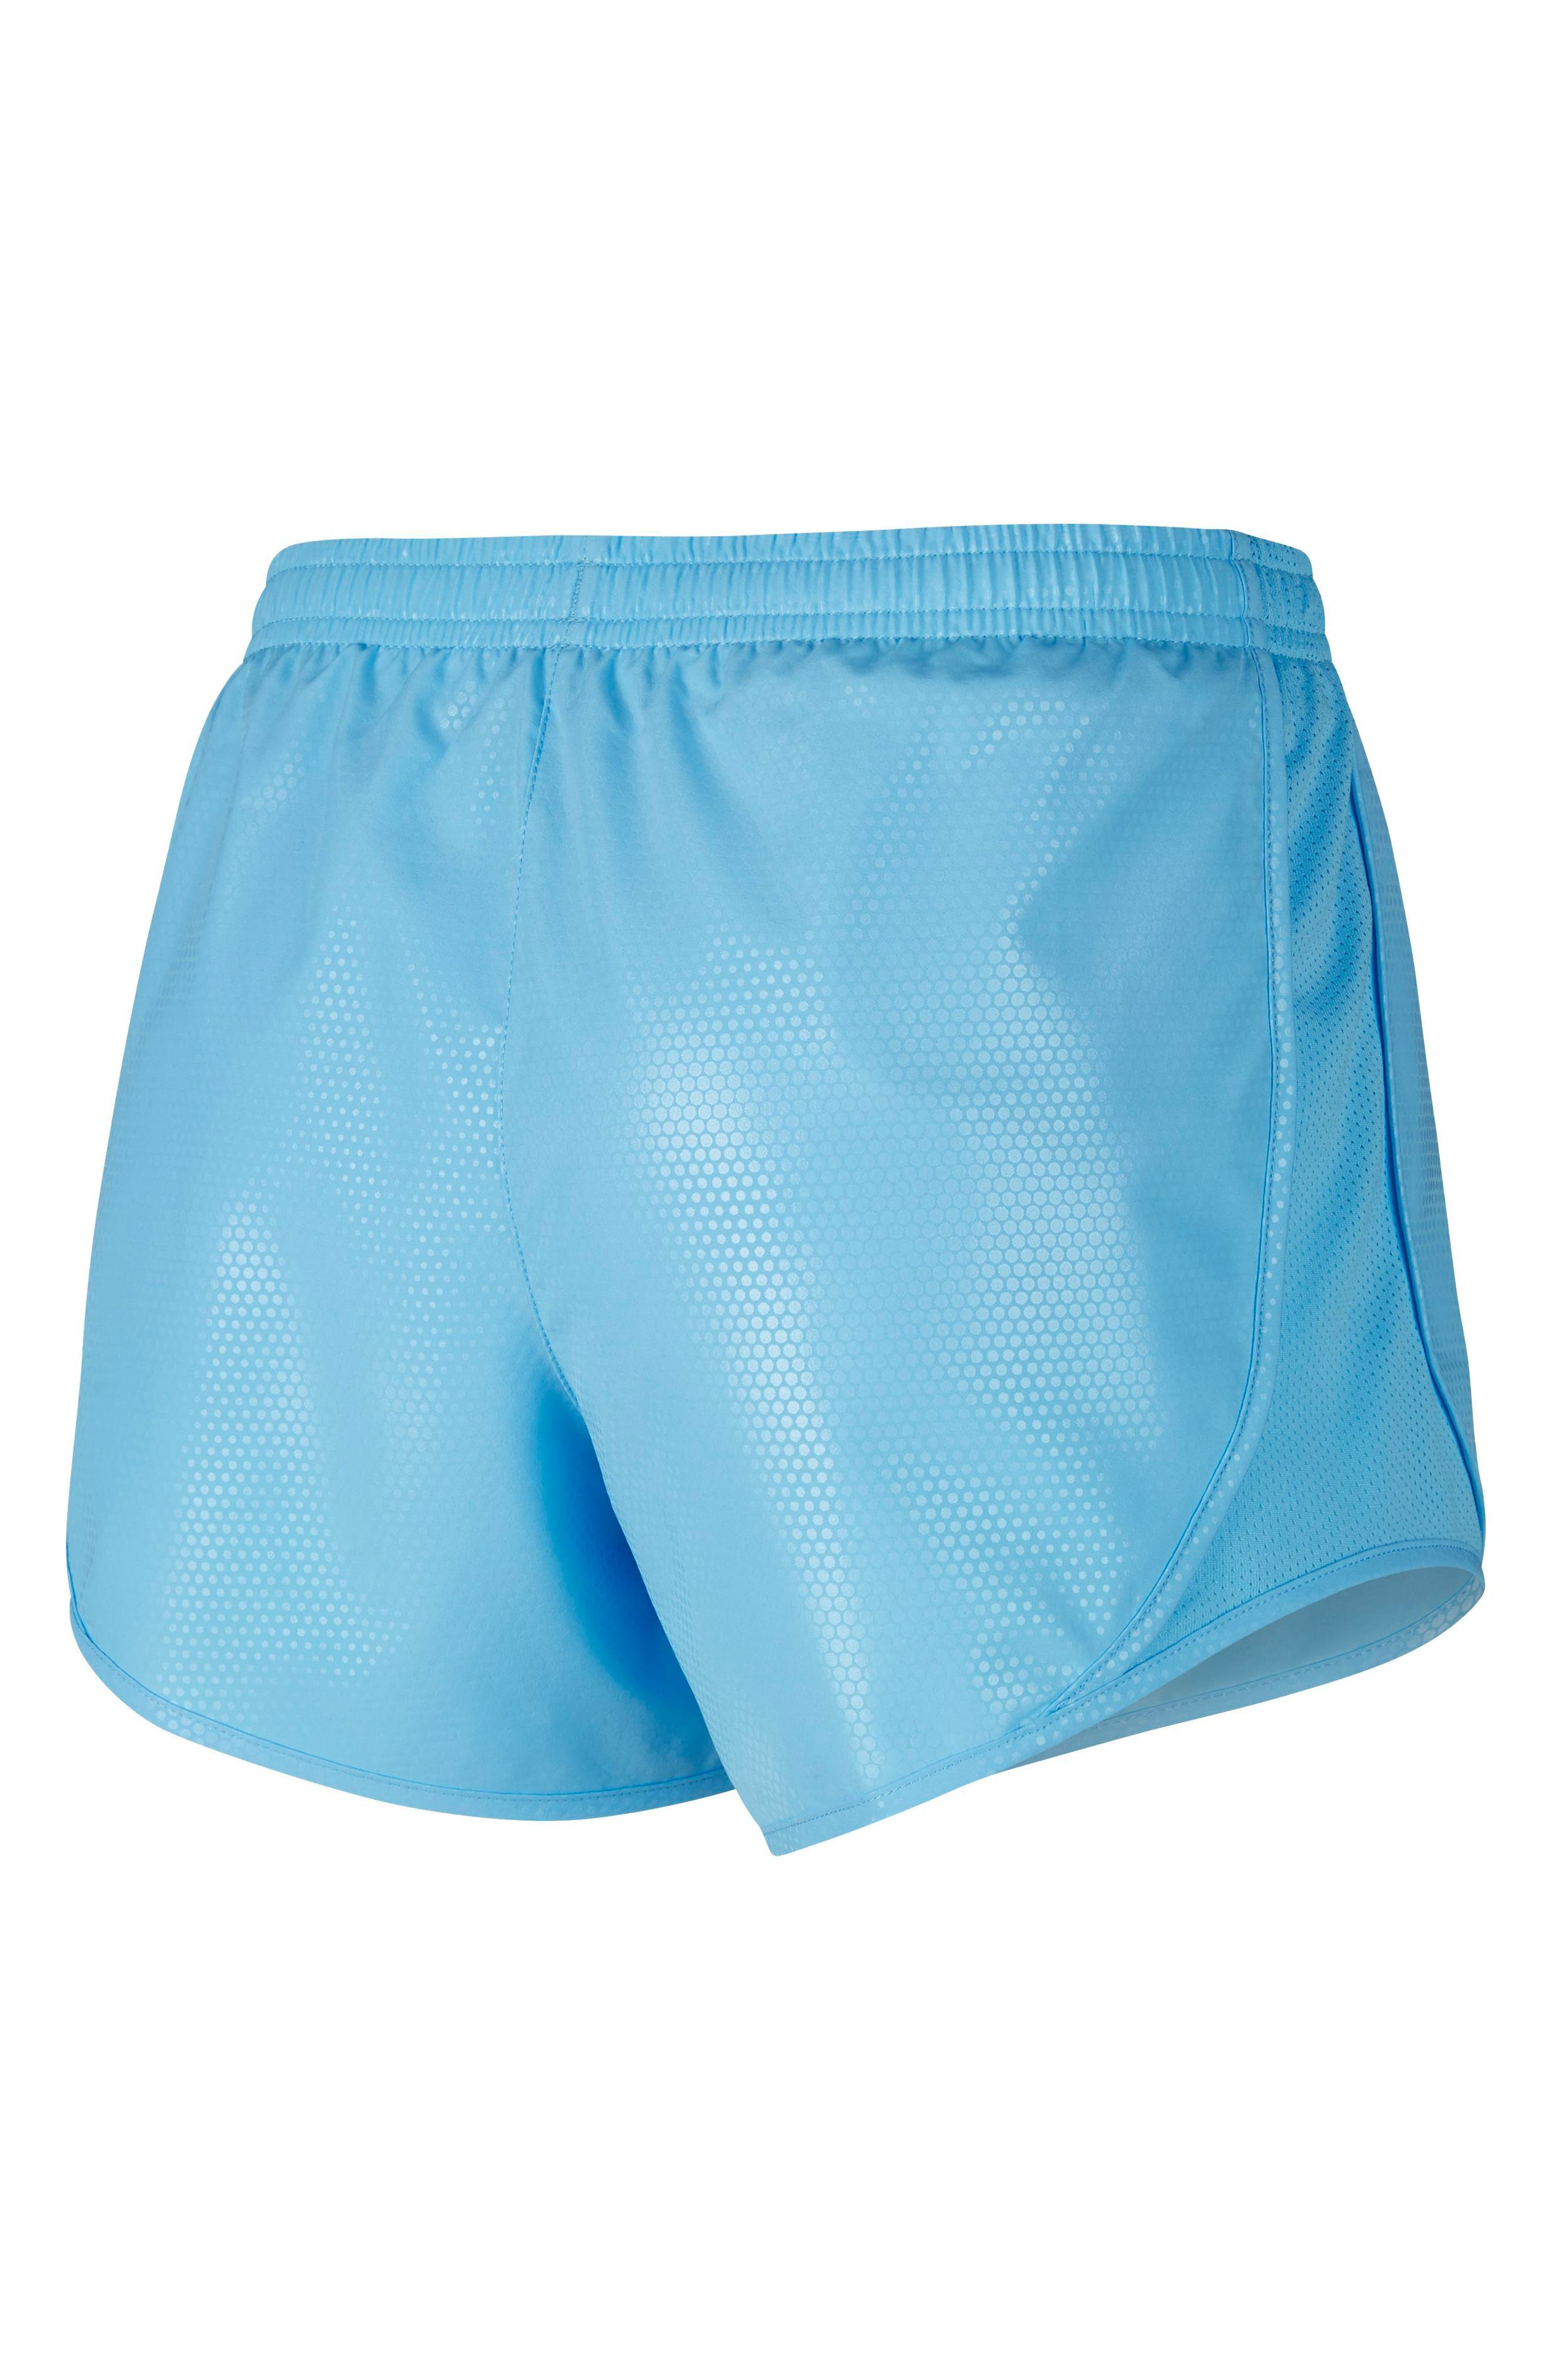 Dry Tempo Shorts,                             Alternate thumbnail 2, color,                             Blue Chill/ White